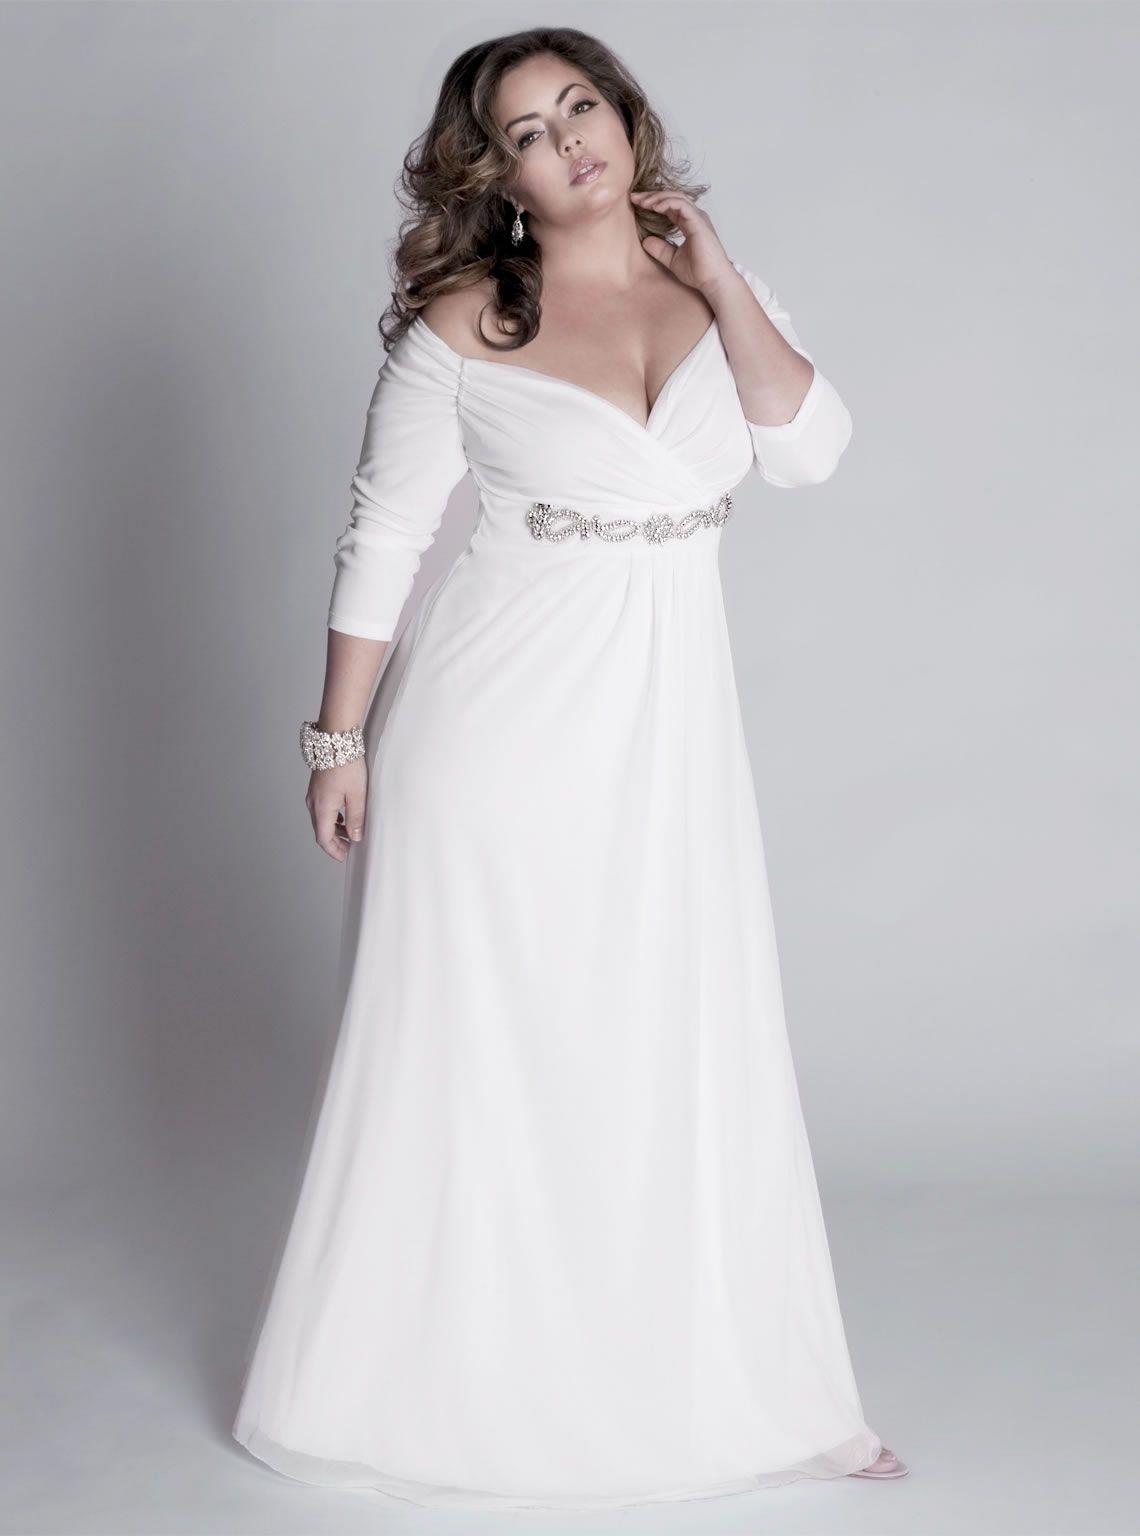 plus size gowns for weddings elegant dresses for wedding Plus size gowns for weddings Lace Ball Gown Wedding Dresses For Plus Size Plus Size